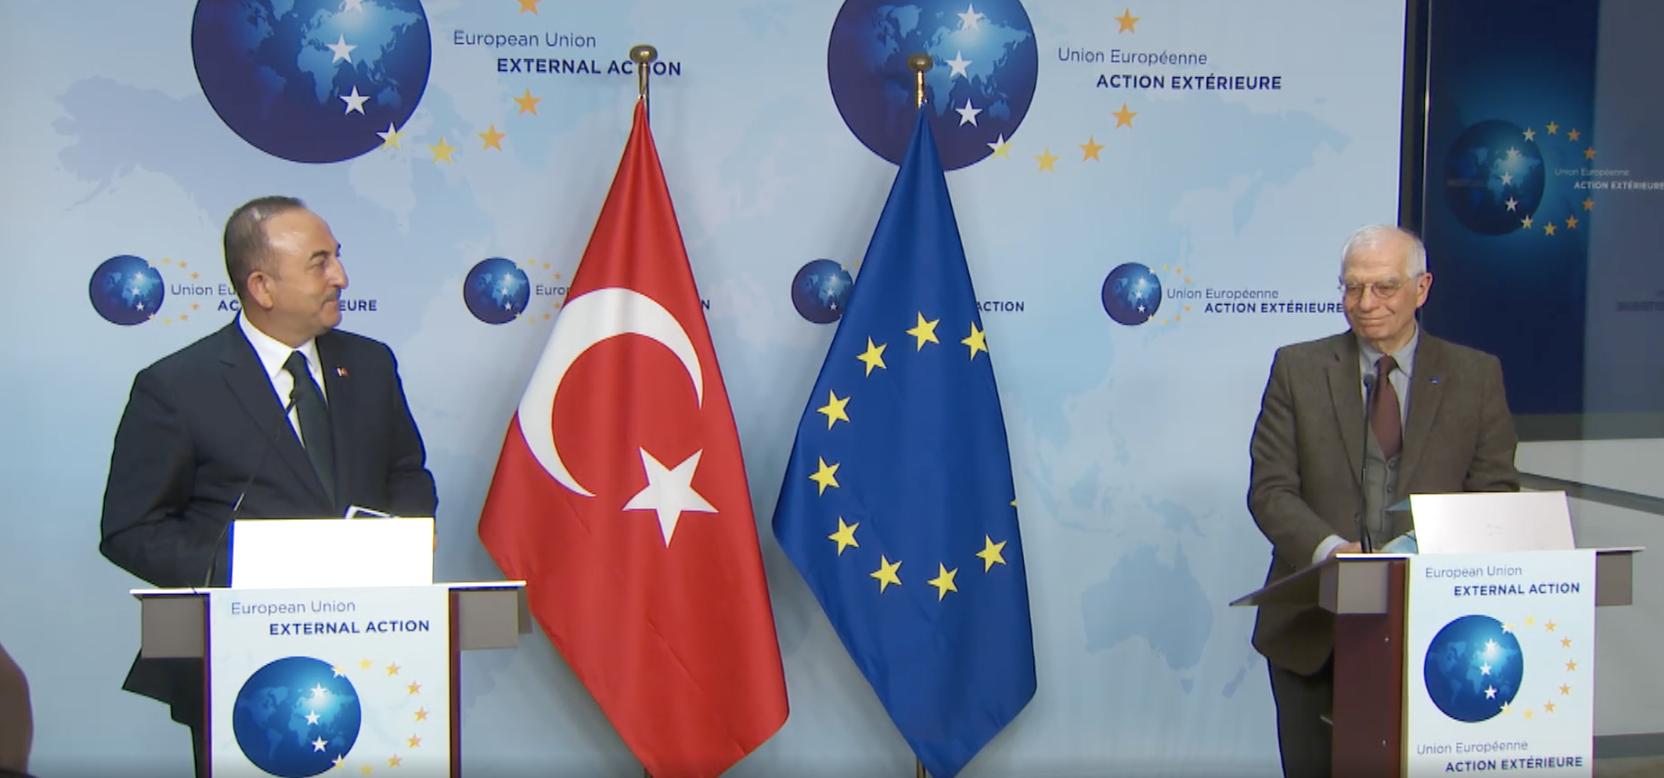 Çavuşoĝlu: Turkey-EU relations are important for prosperity in our region